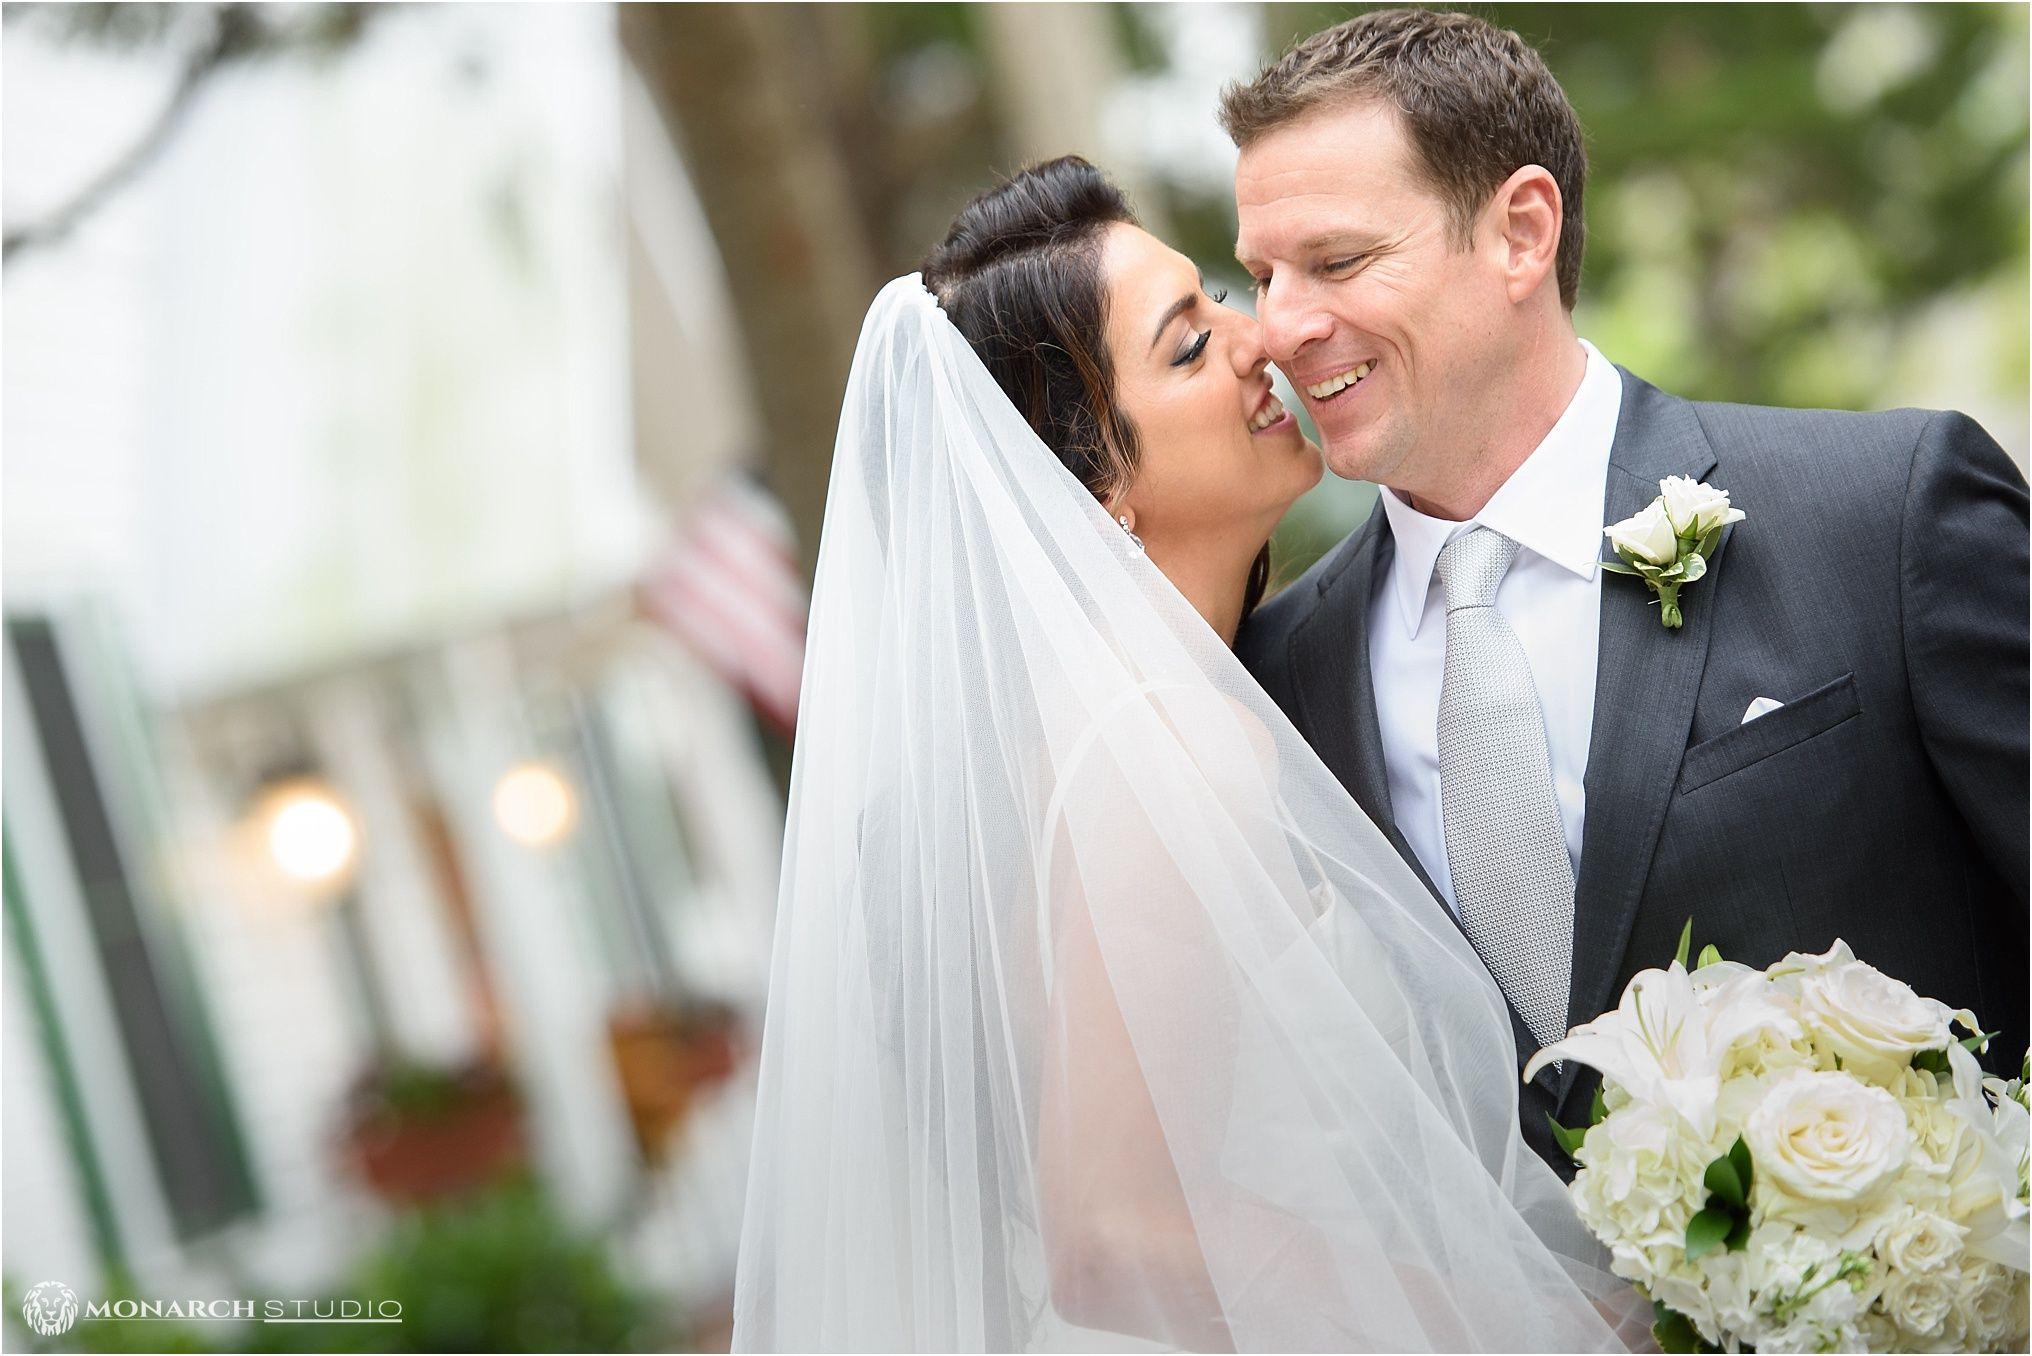 unique wedding locations in st. augustine florida - maggie